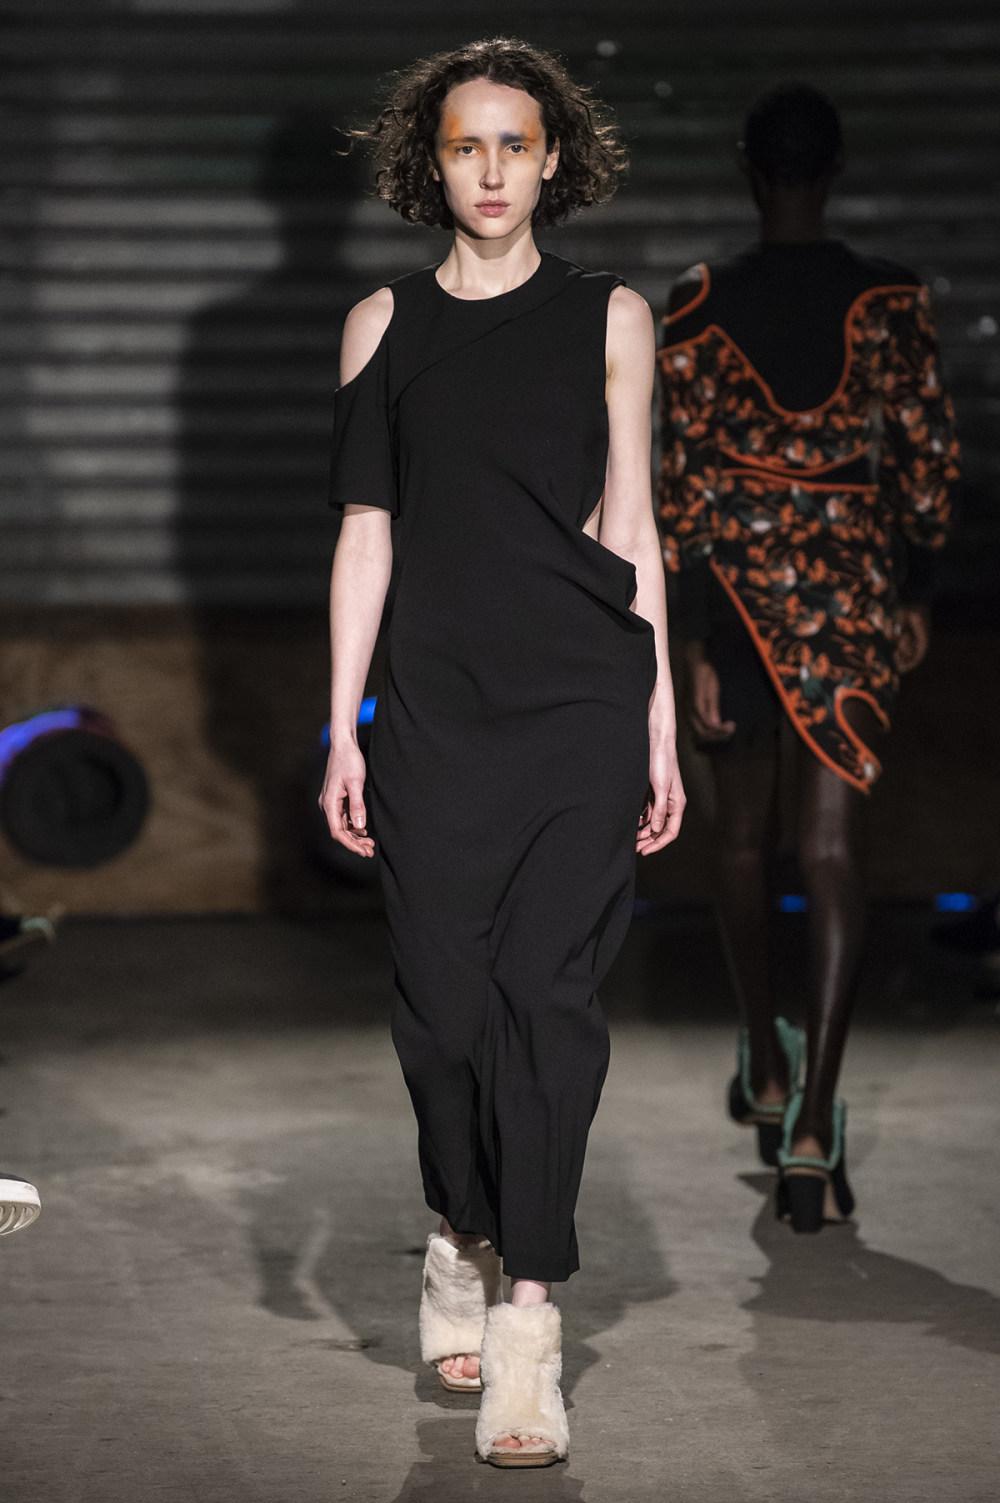 Eckhaus Latta时装系列采用了更加结构化的剪裁和图案提花-31.jpg